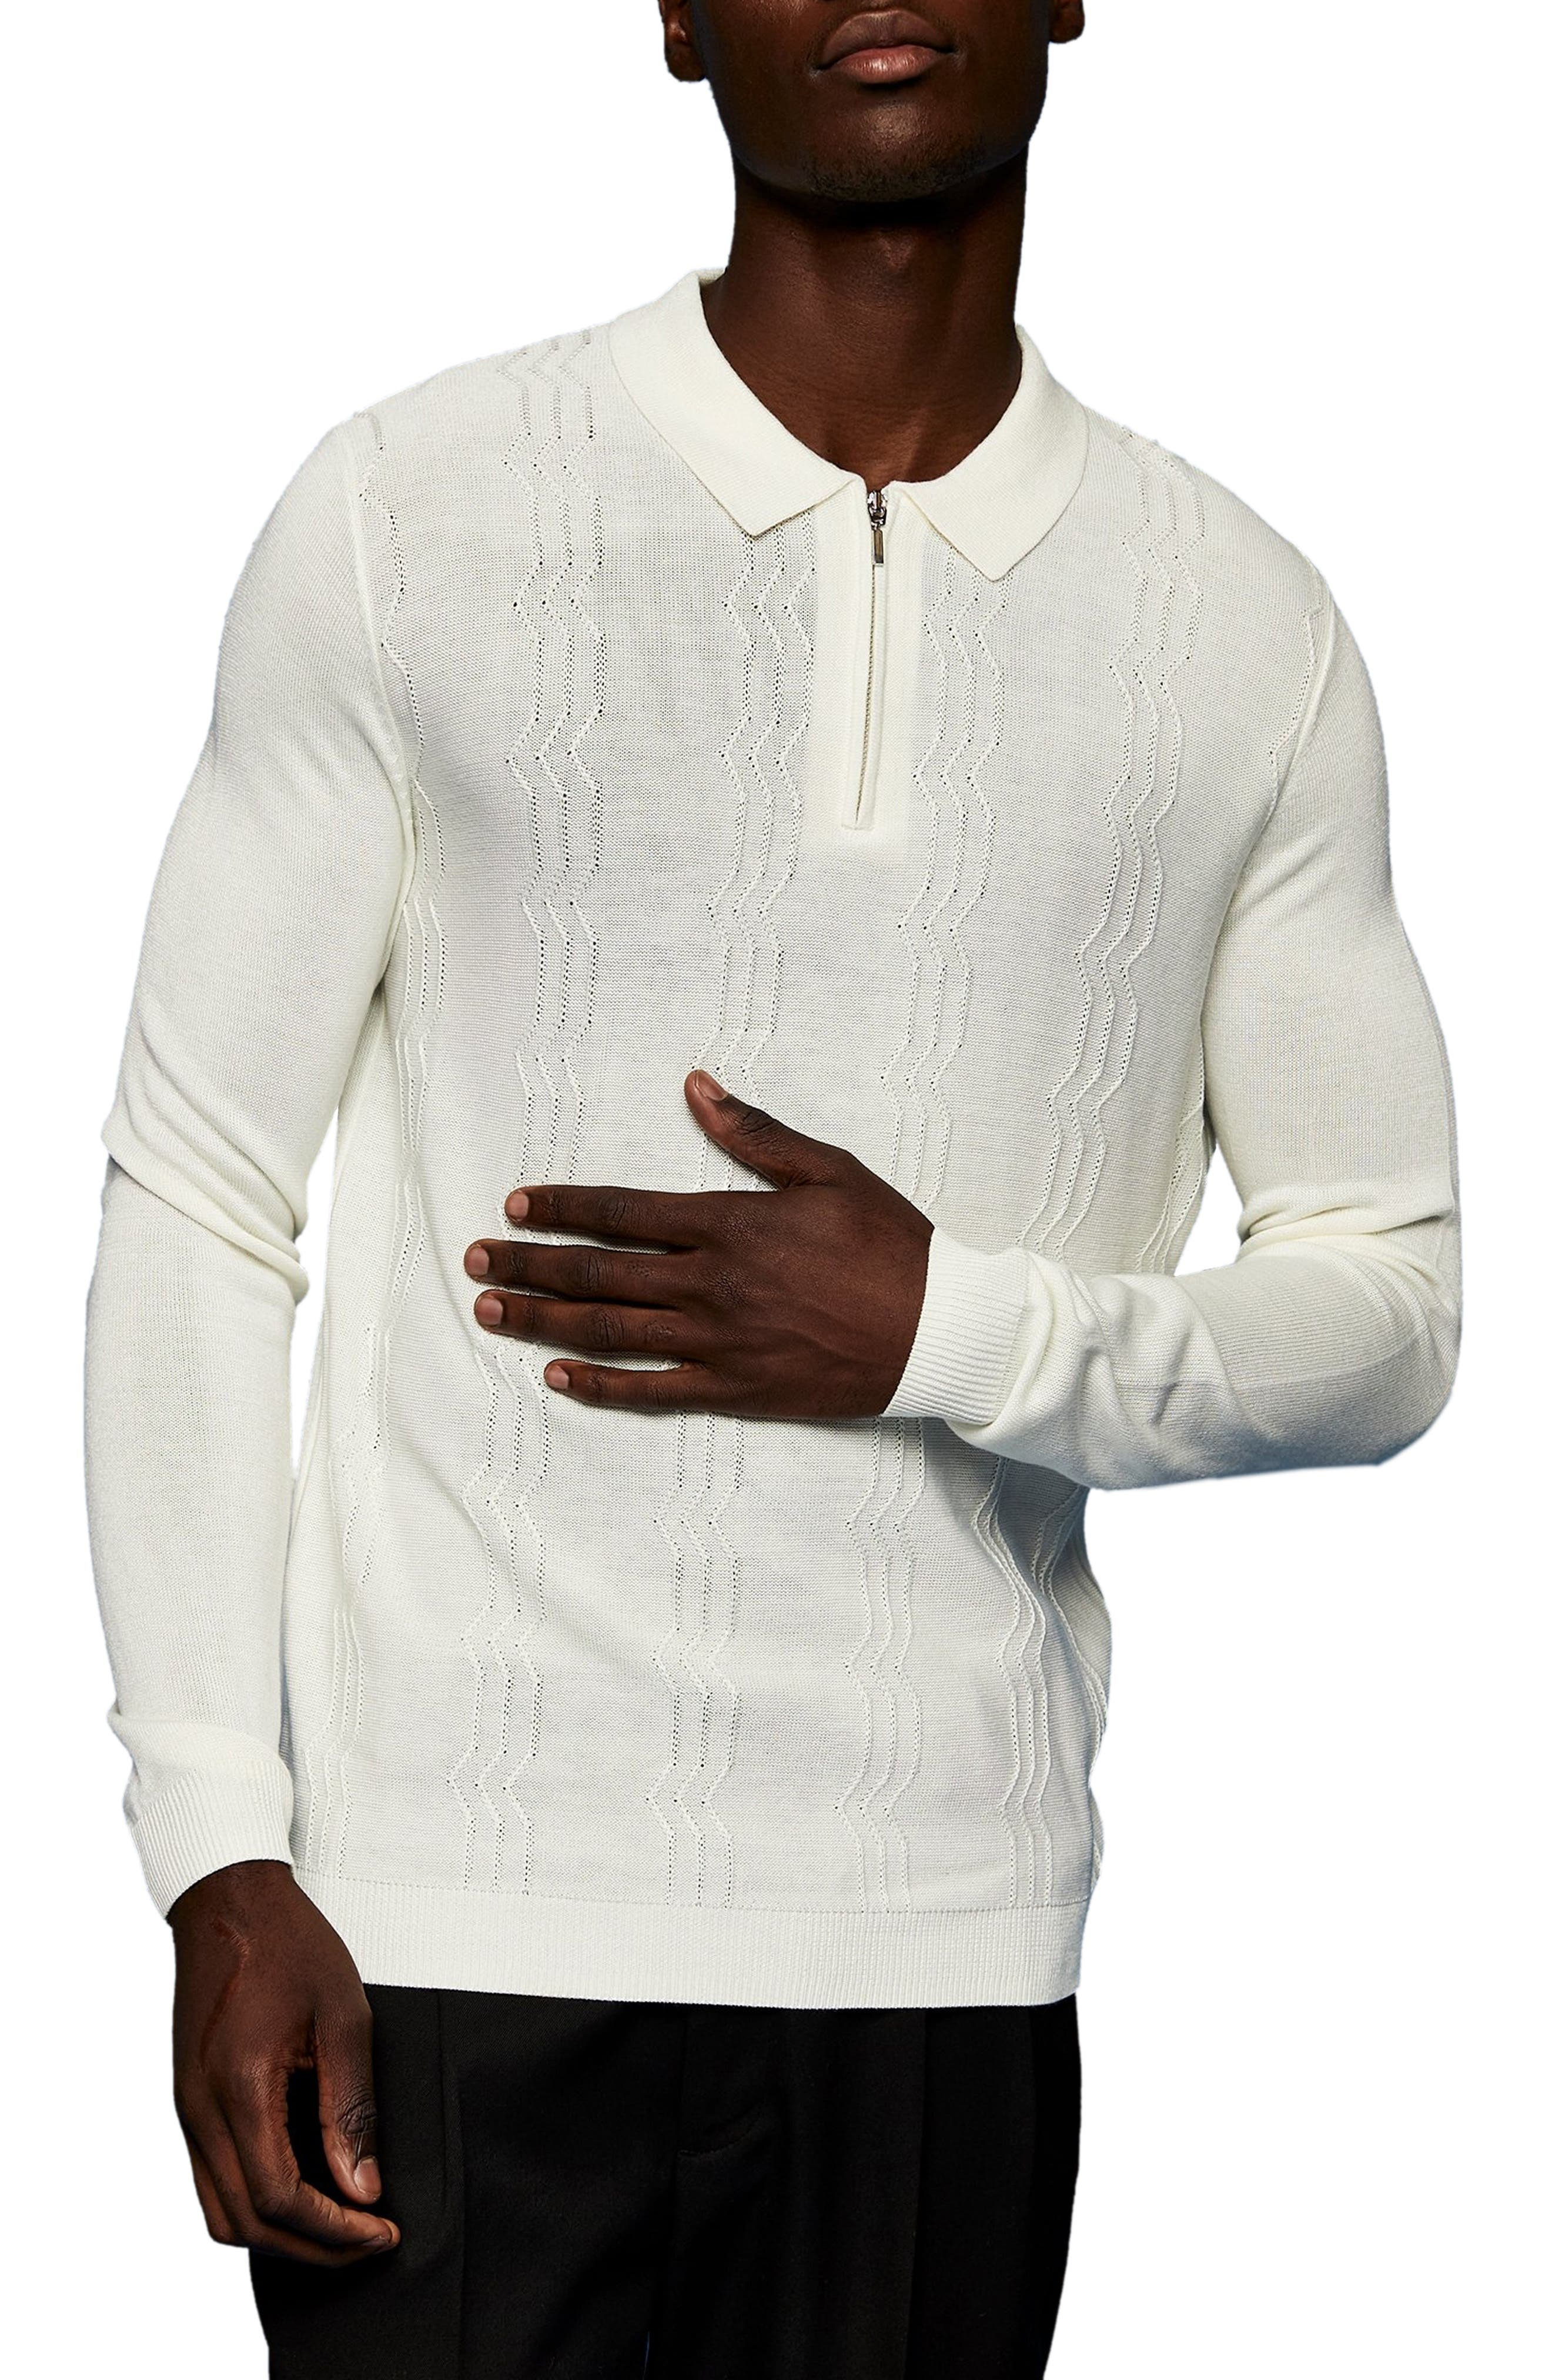 1930s Mens Shirts   Dress Shirts, Polo Shirts, Work Shirts Mens Topman Zigzag Knit Long Sleeve Polo Size XX-Small - Ivory $55.00 AT vintagedancer.com